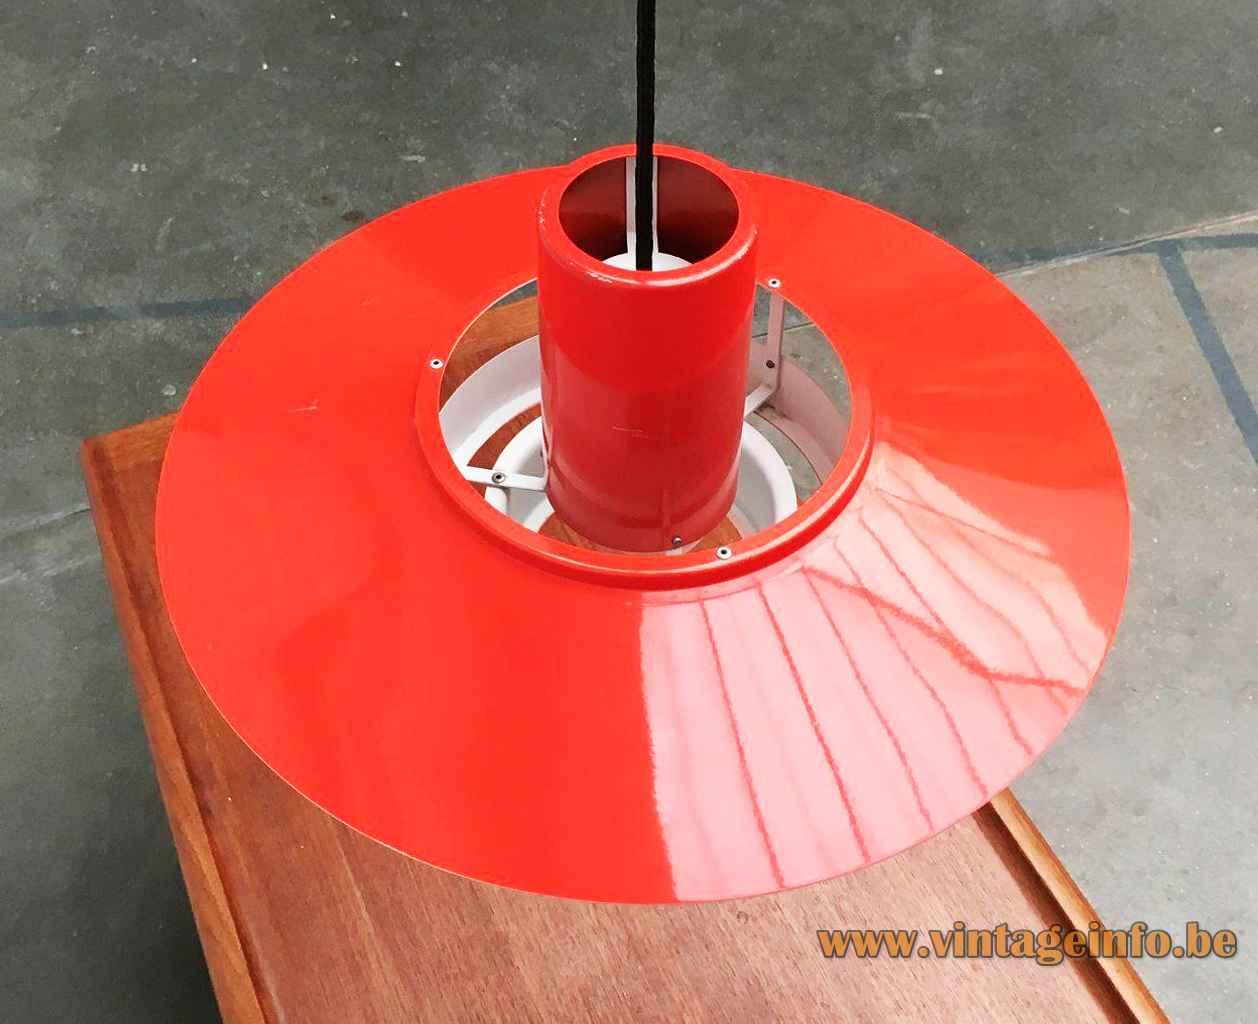 Fog & Morup Falcon pendant lamp red round metal lampshade 1960s design: Andreas Hansen Denmark E27 socket